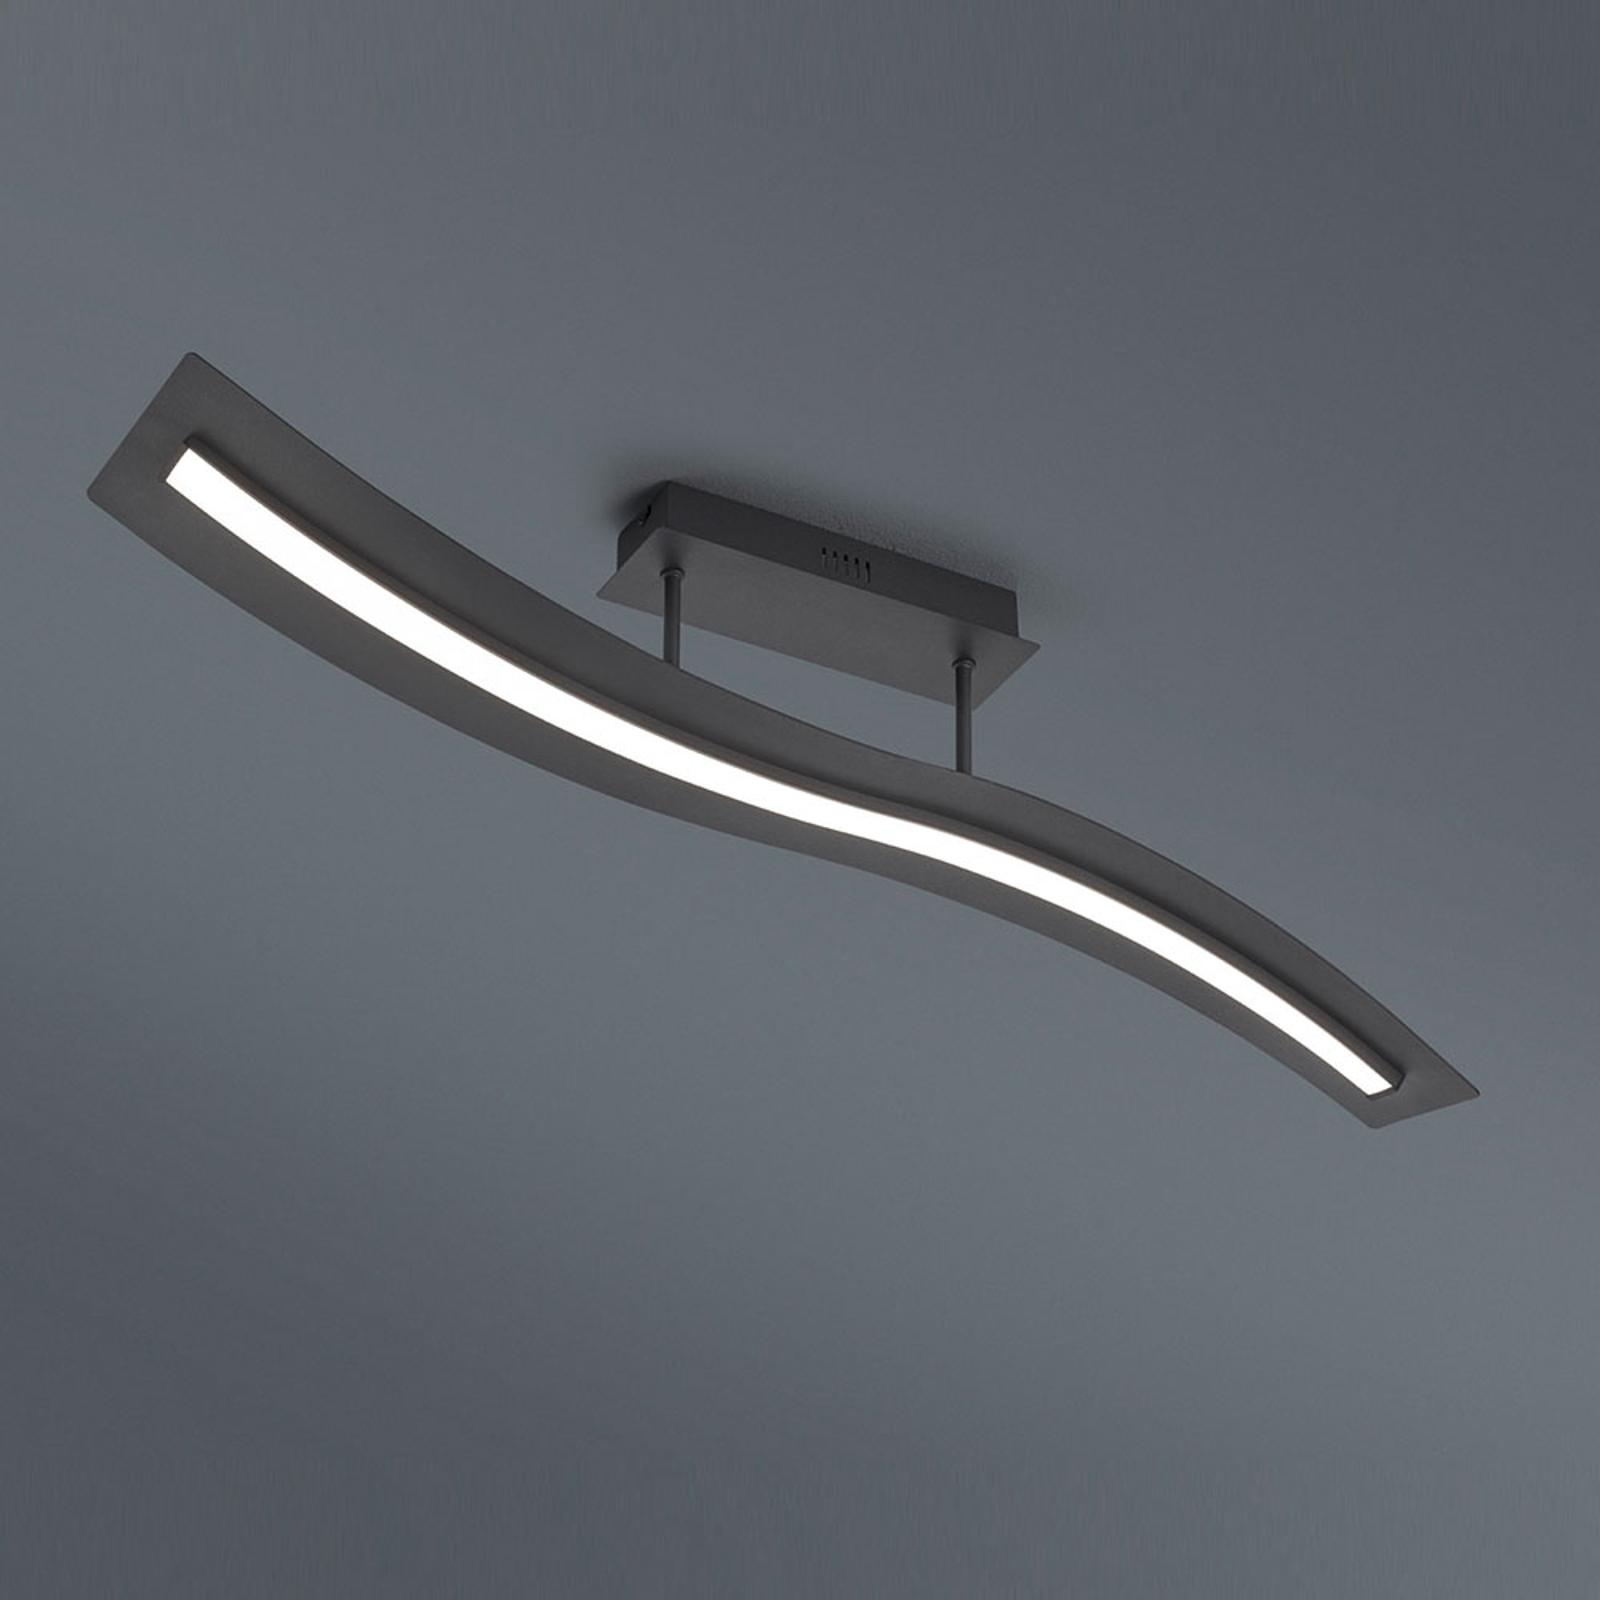 Plafonnier LED Salerno, SwitchDim, noir mat